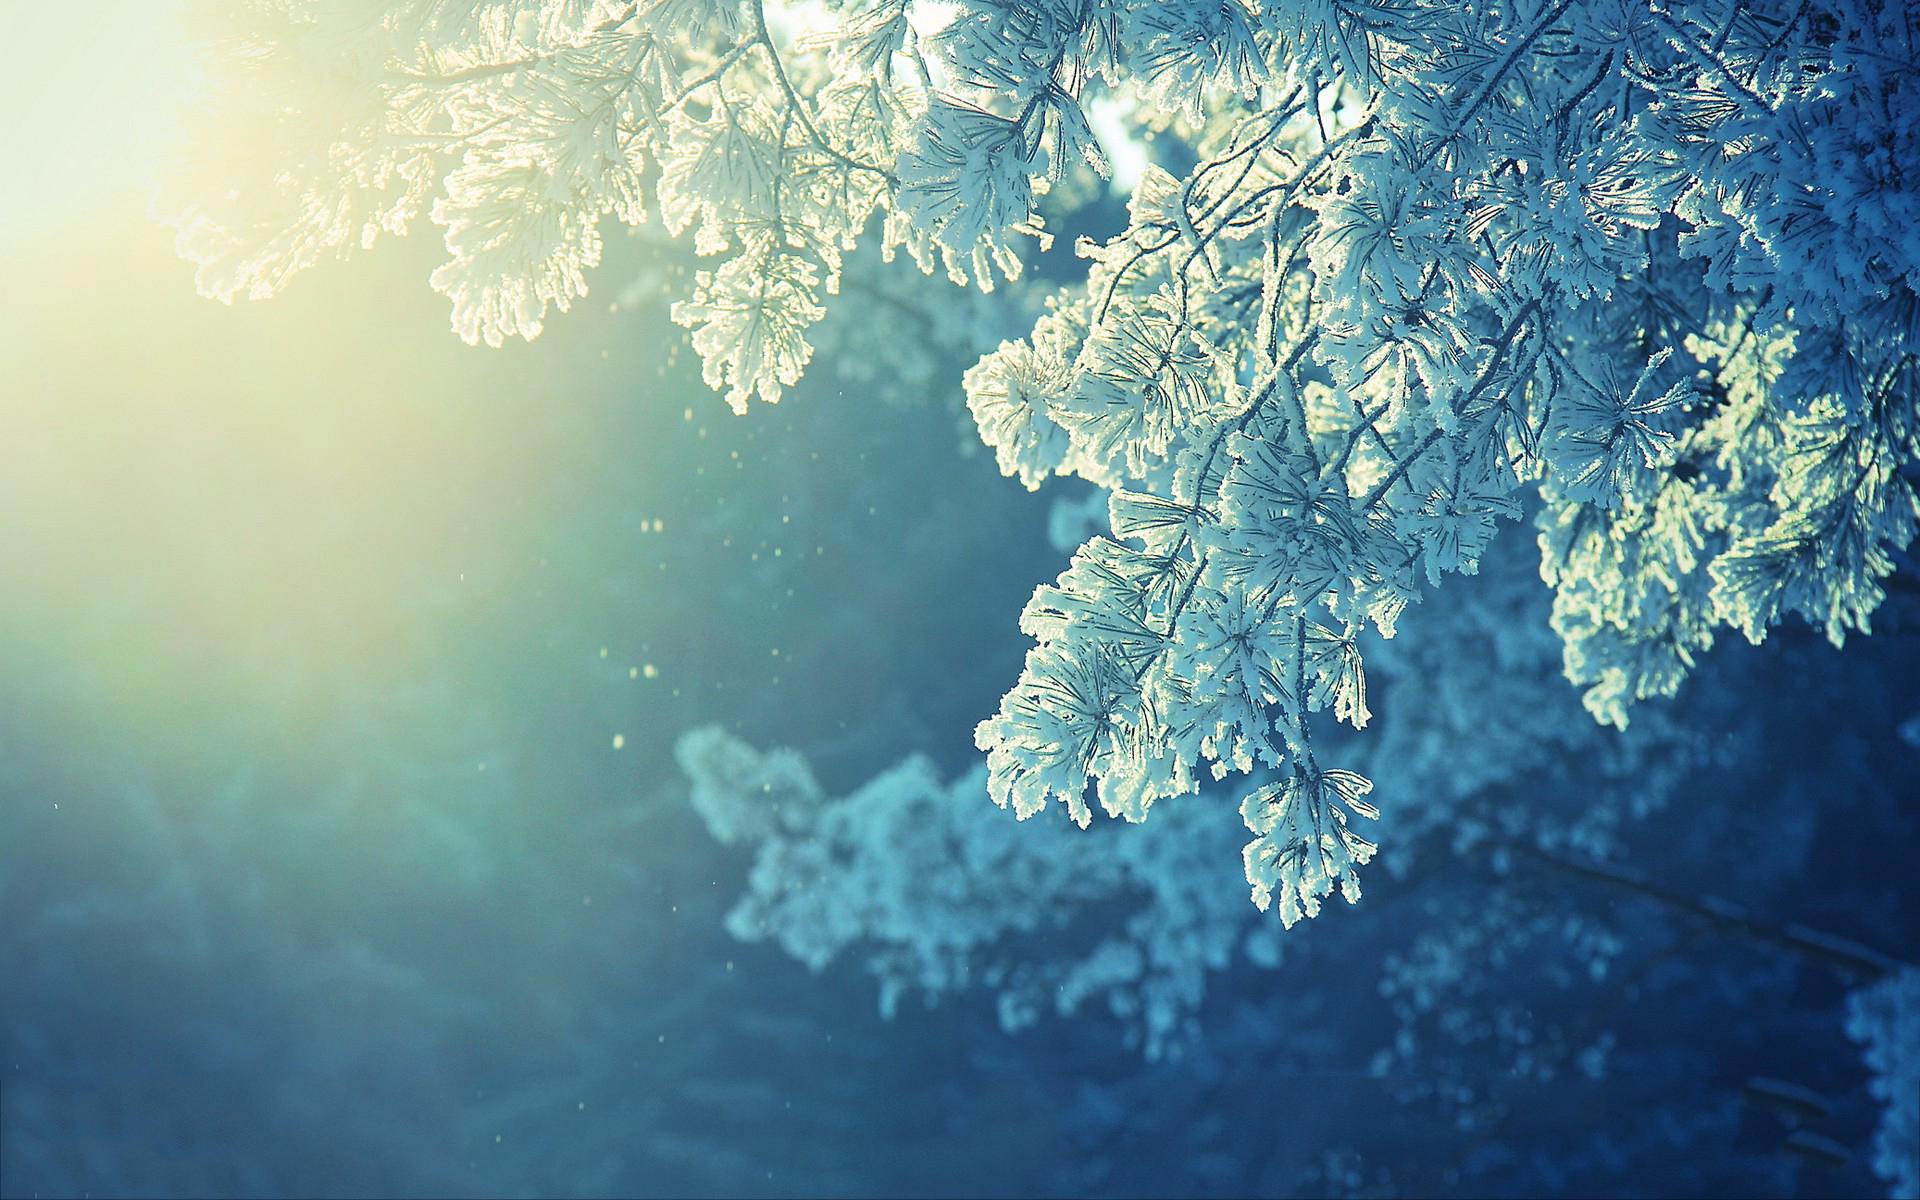 Backgrounds Winter  HD Desktop Wallpapers 4k